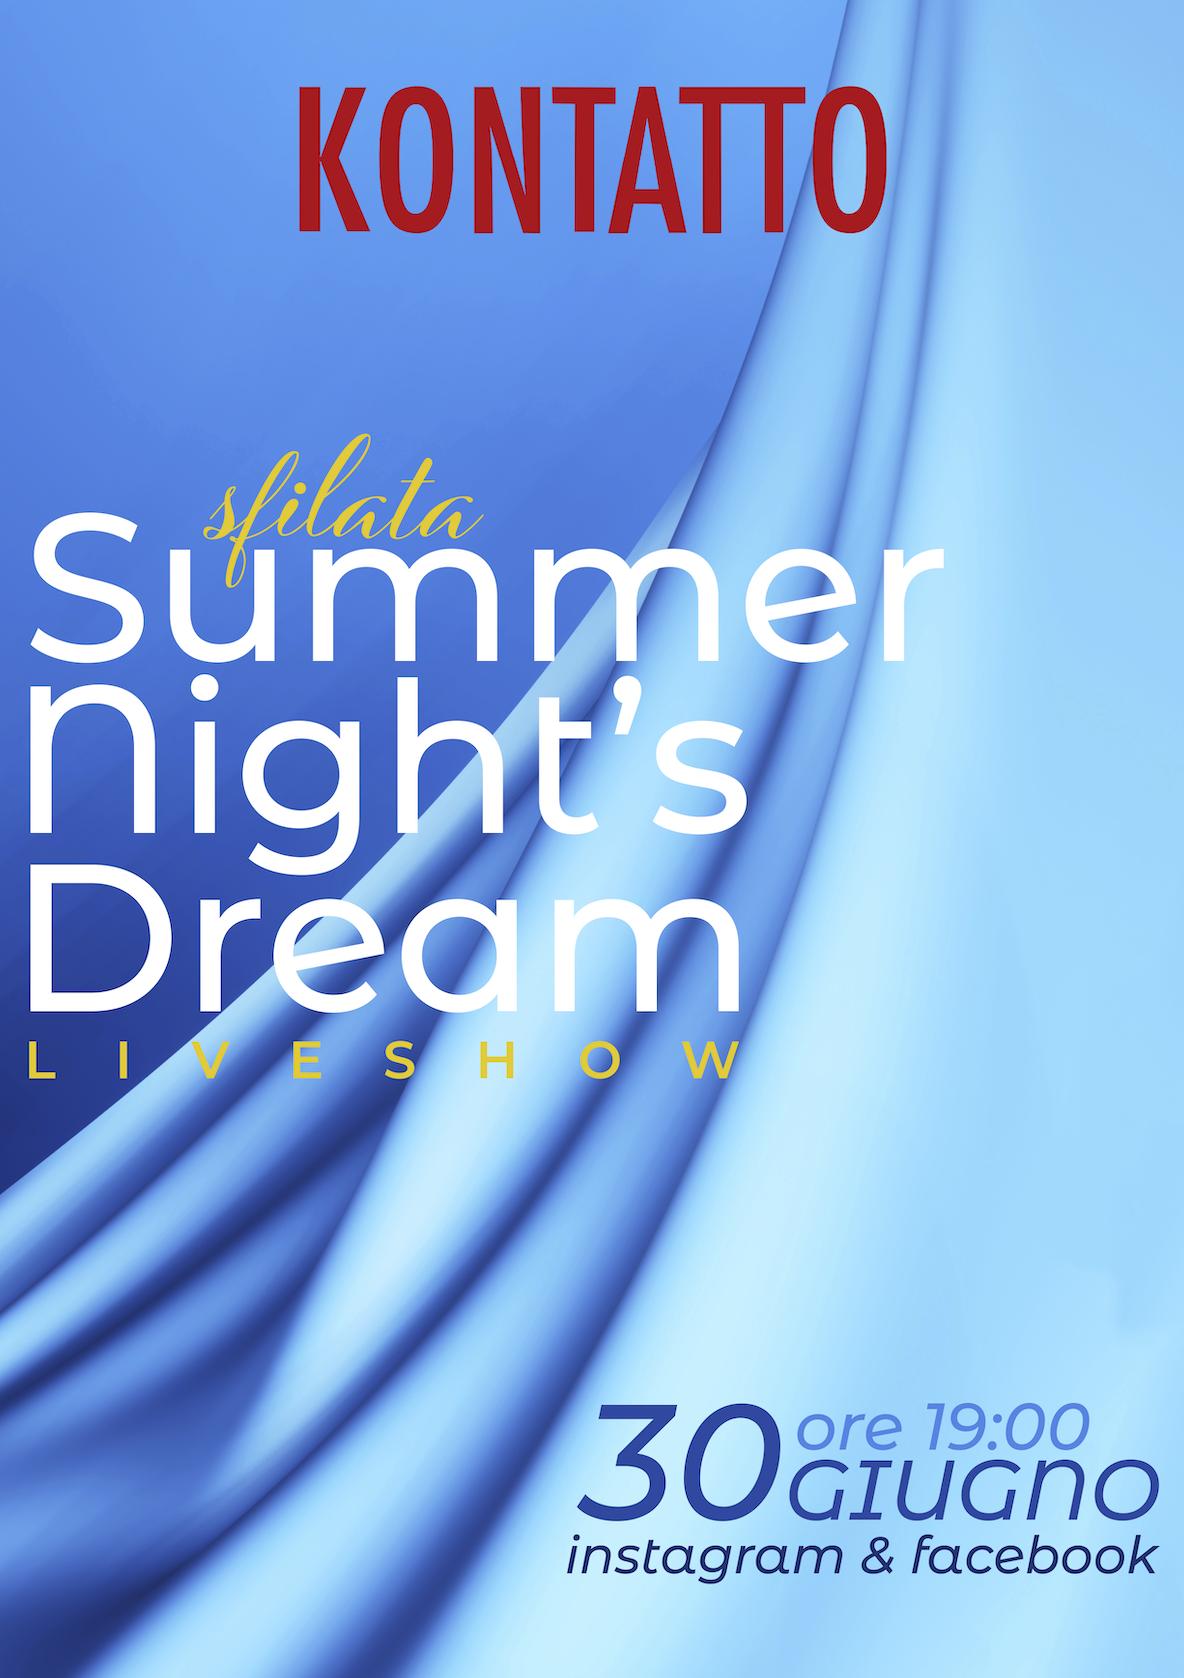 SUMMER NIGHT'S DREAM live show